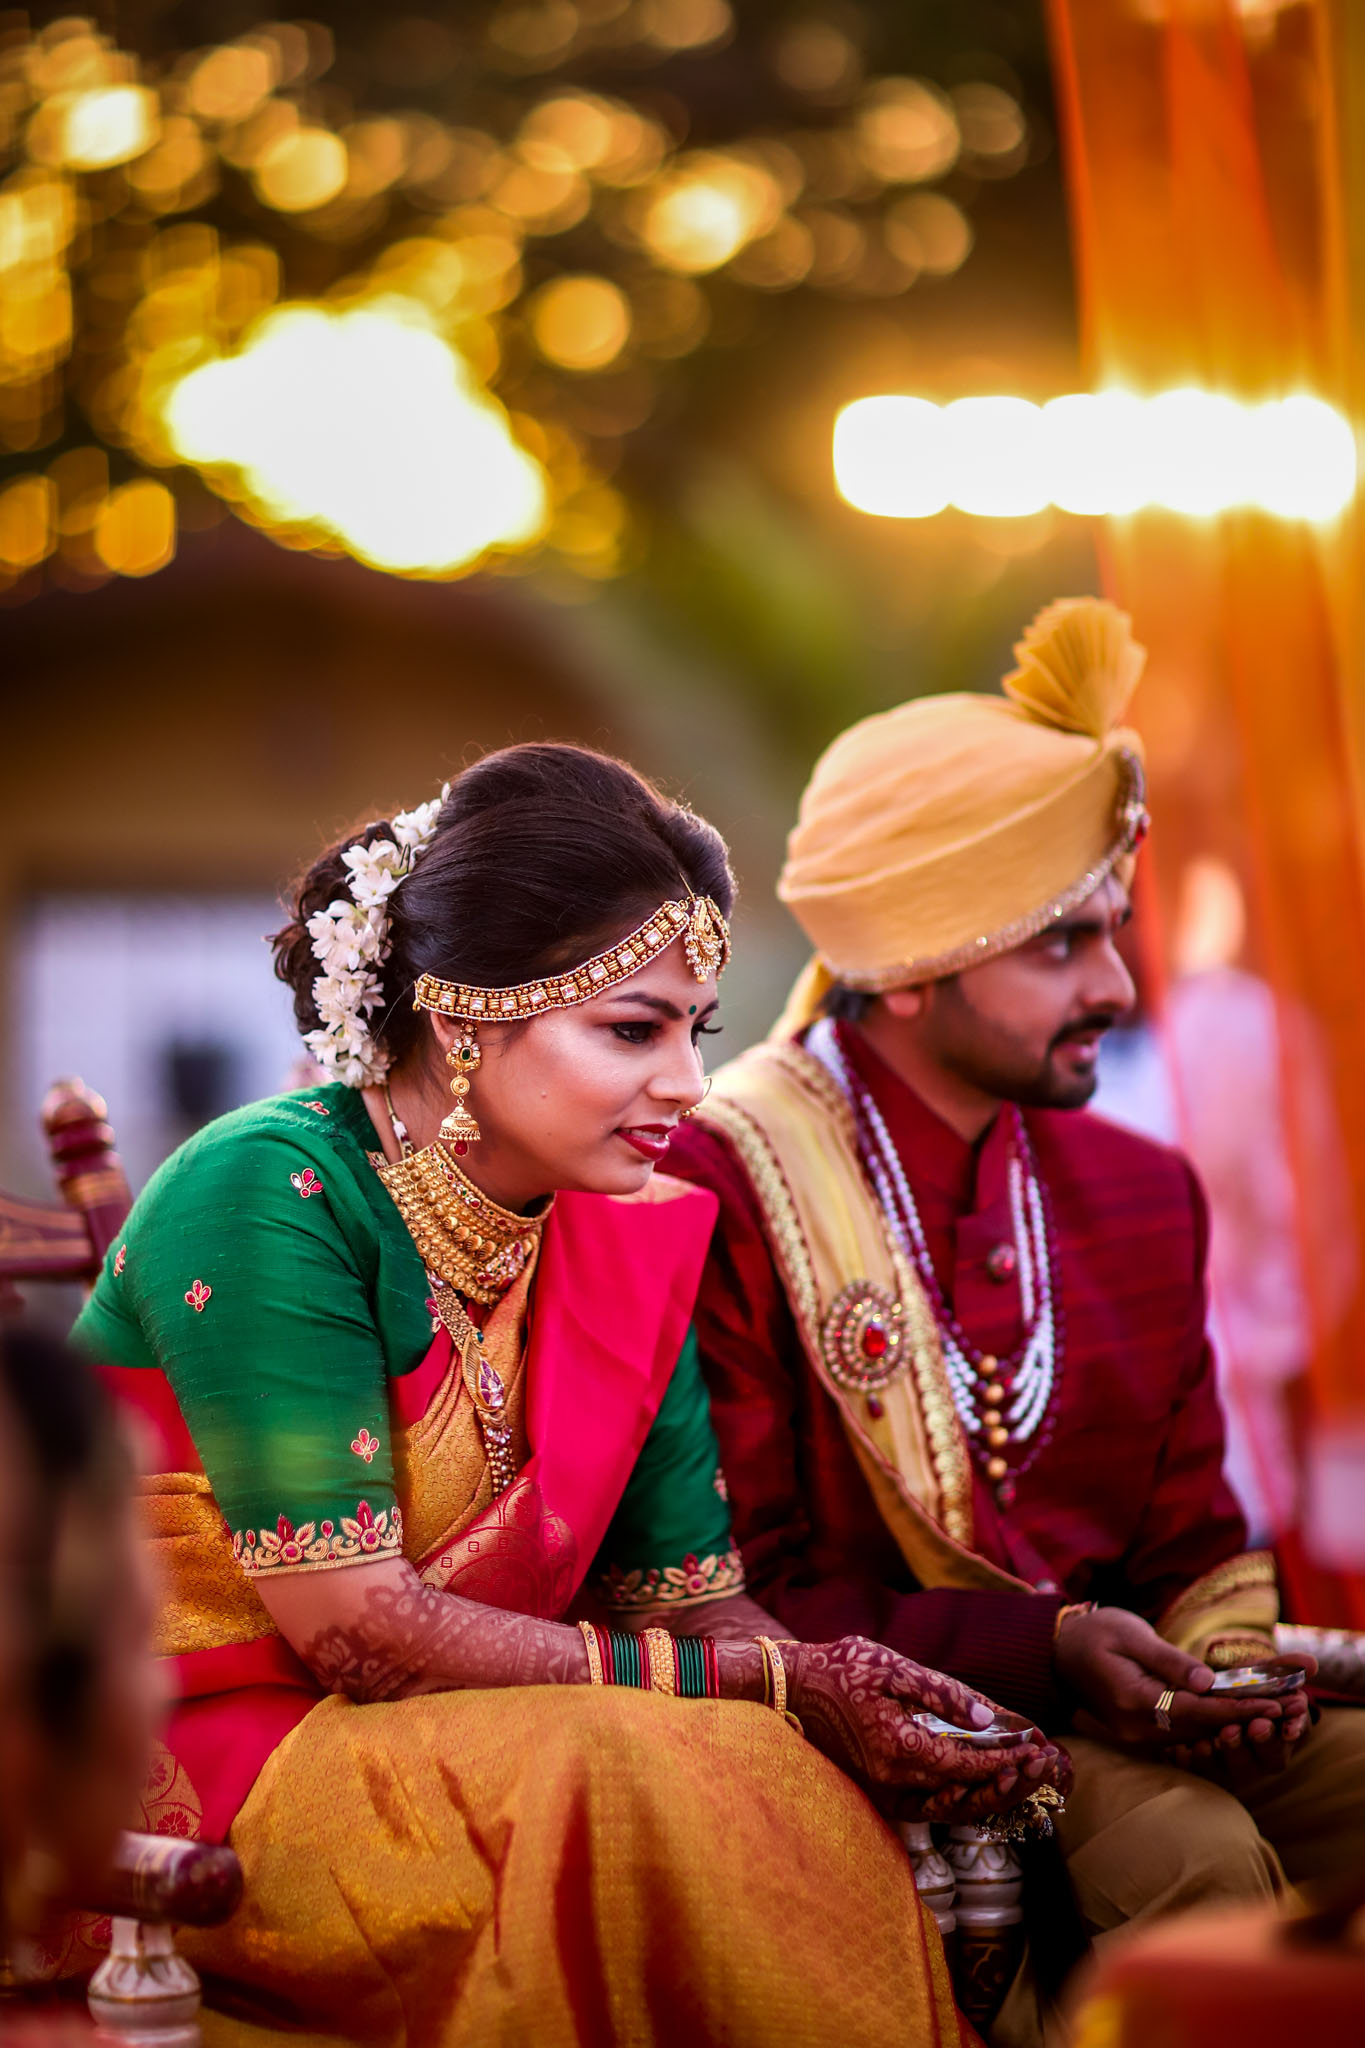 Mukti x Ojas Wedding Akshjay Sansare Photography Best wedding photographer in mumbai India Candid Cinematic Films videos-43.jpg